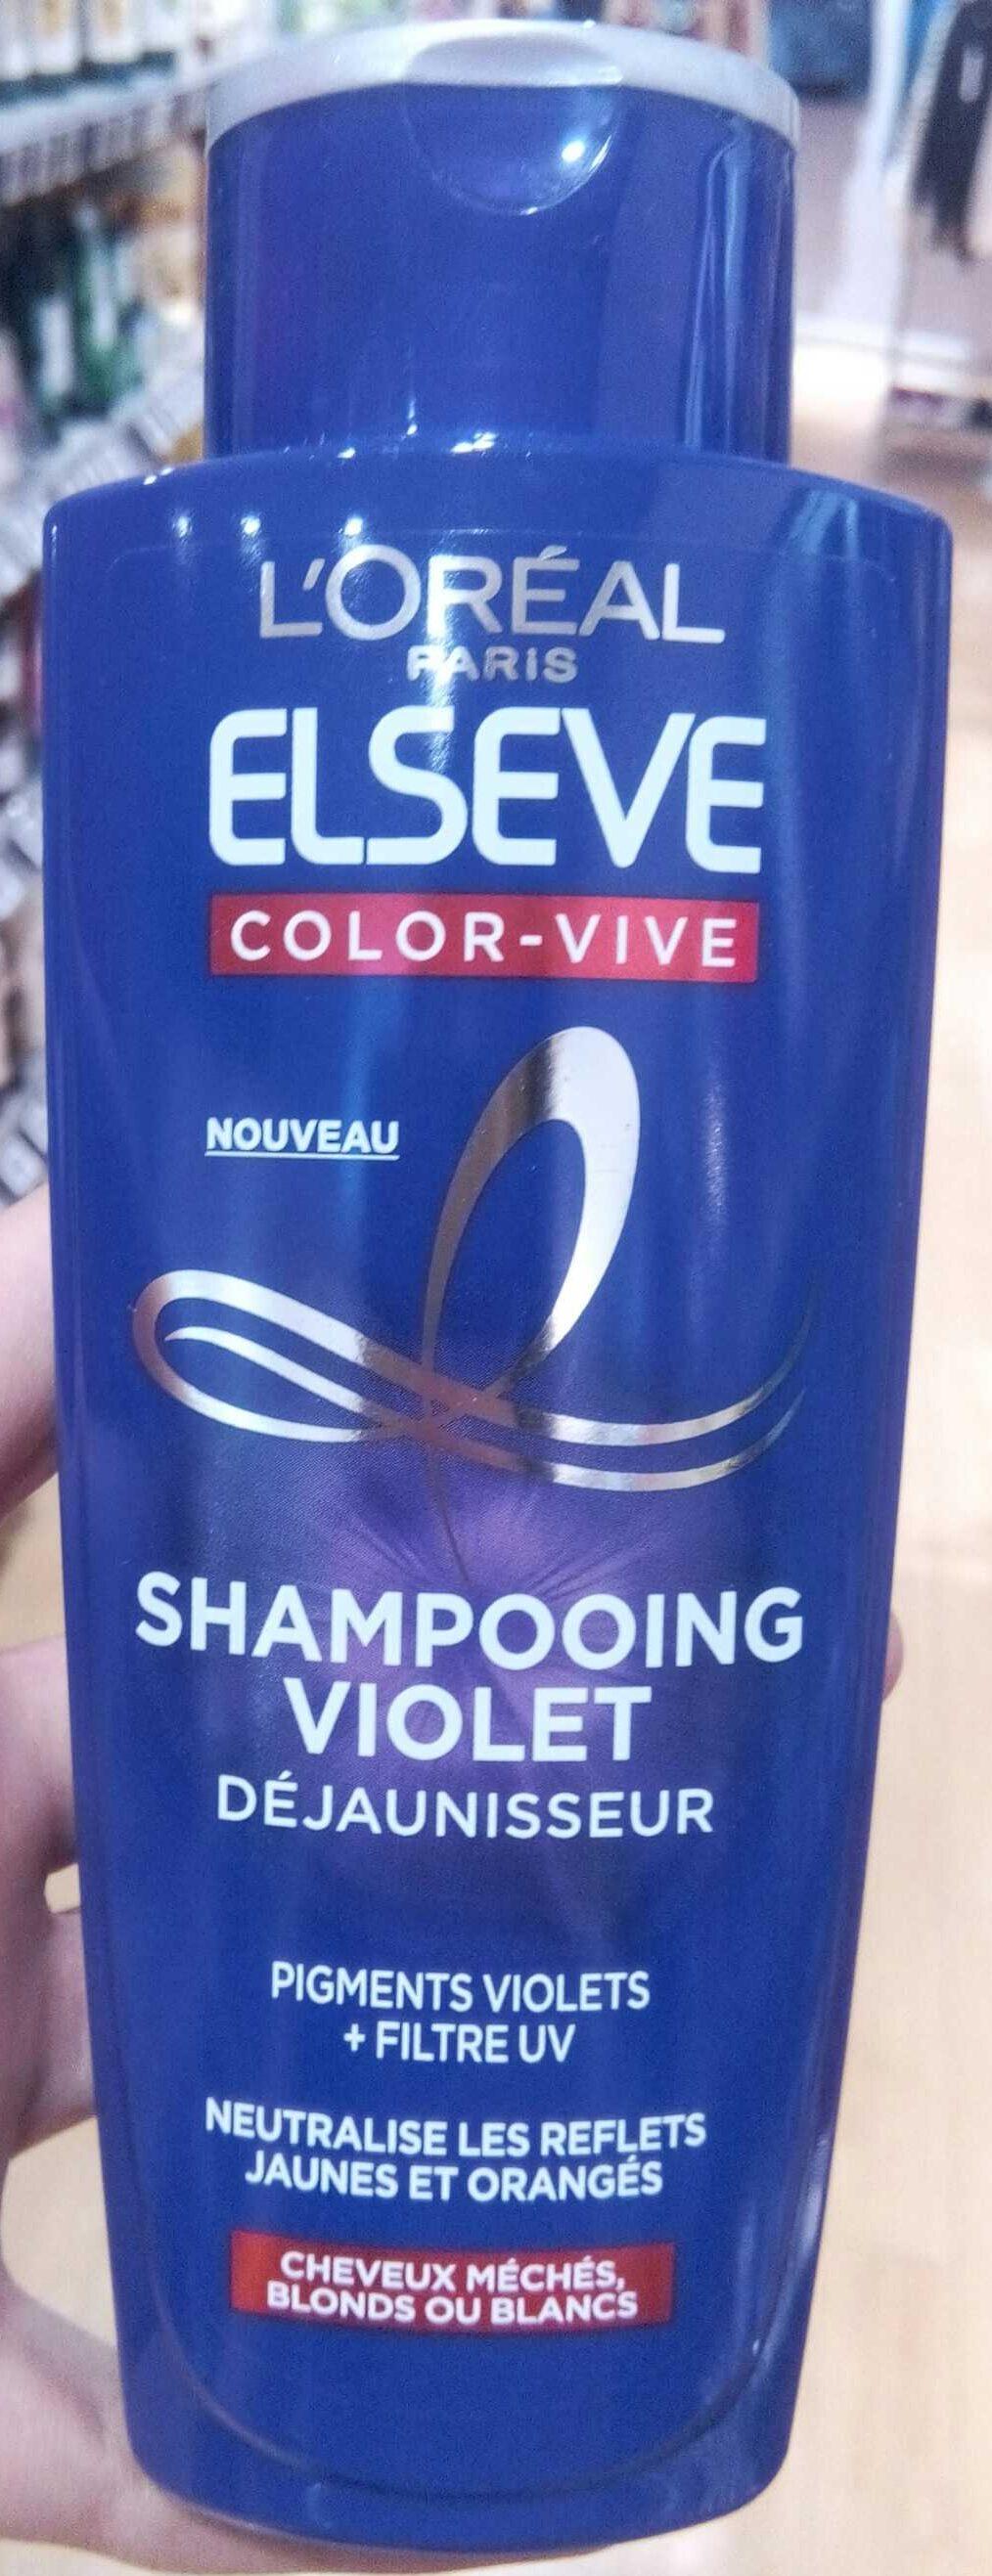 Shampooing violet déjaunisseur - Продукт - fr